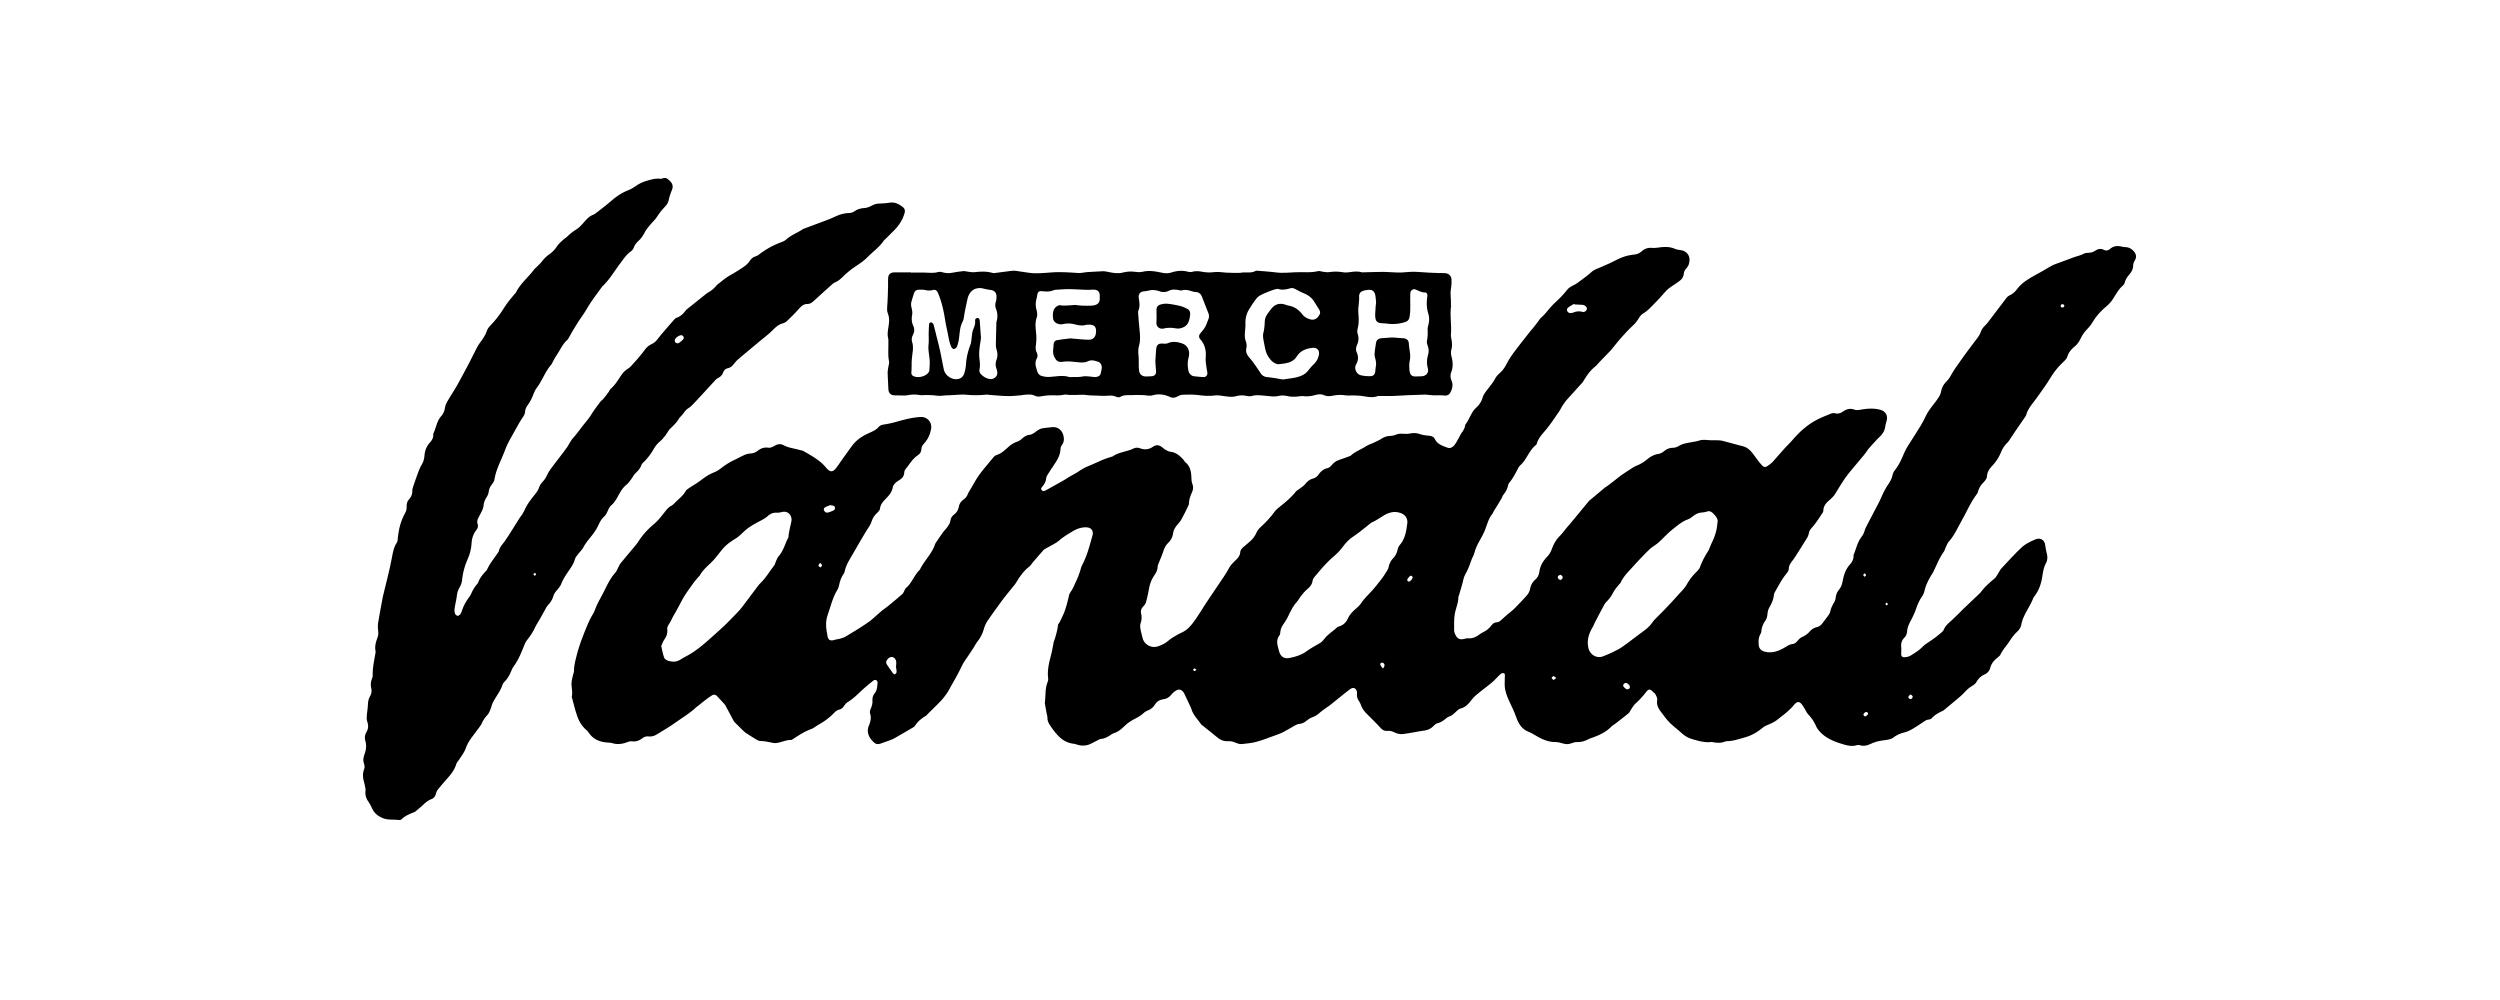 MerchVandal-Header2.jpg